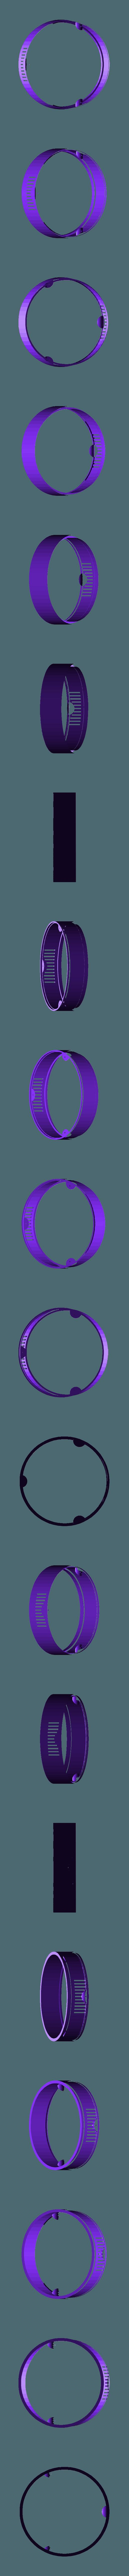 USB_Lamp_front.stl Download free STL file USB Desk Lamp • 3D printable model, Seabird